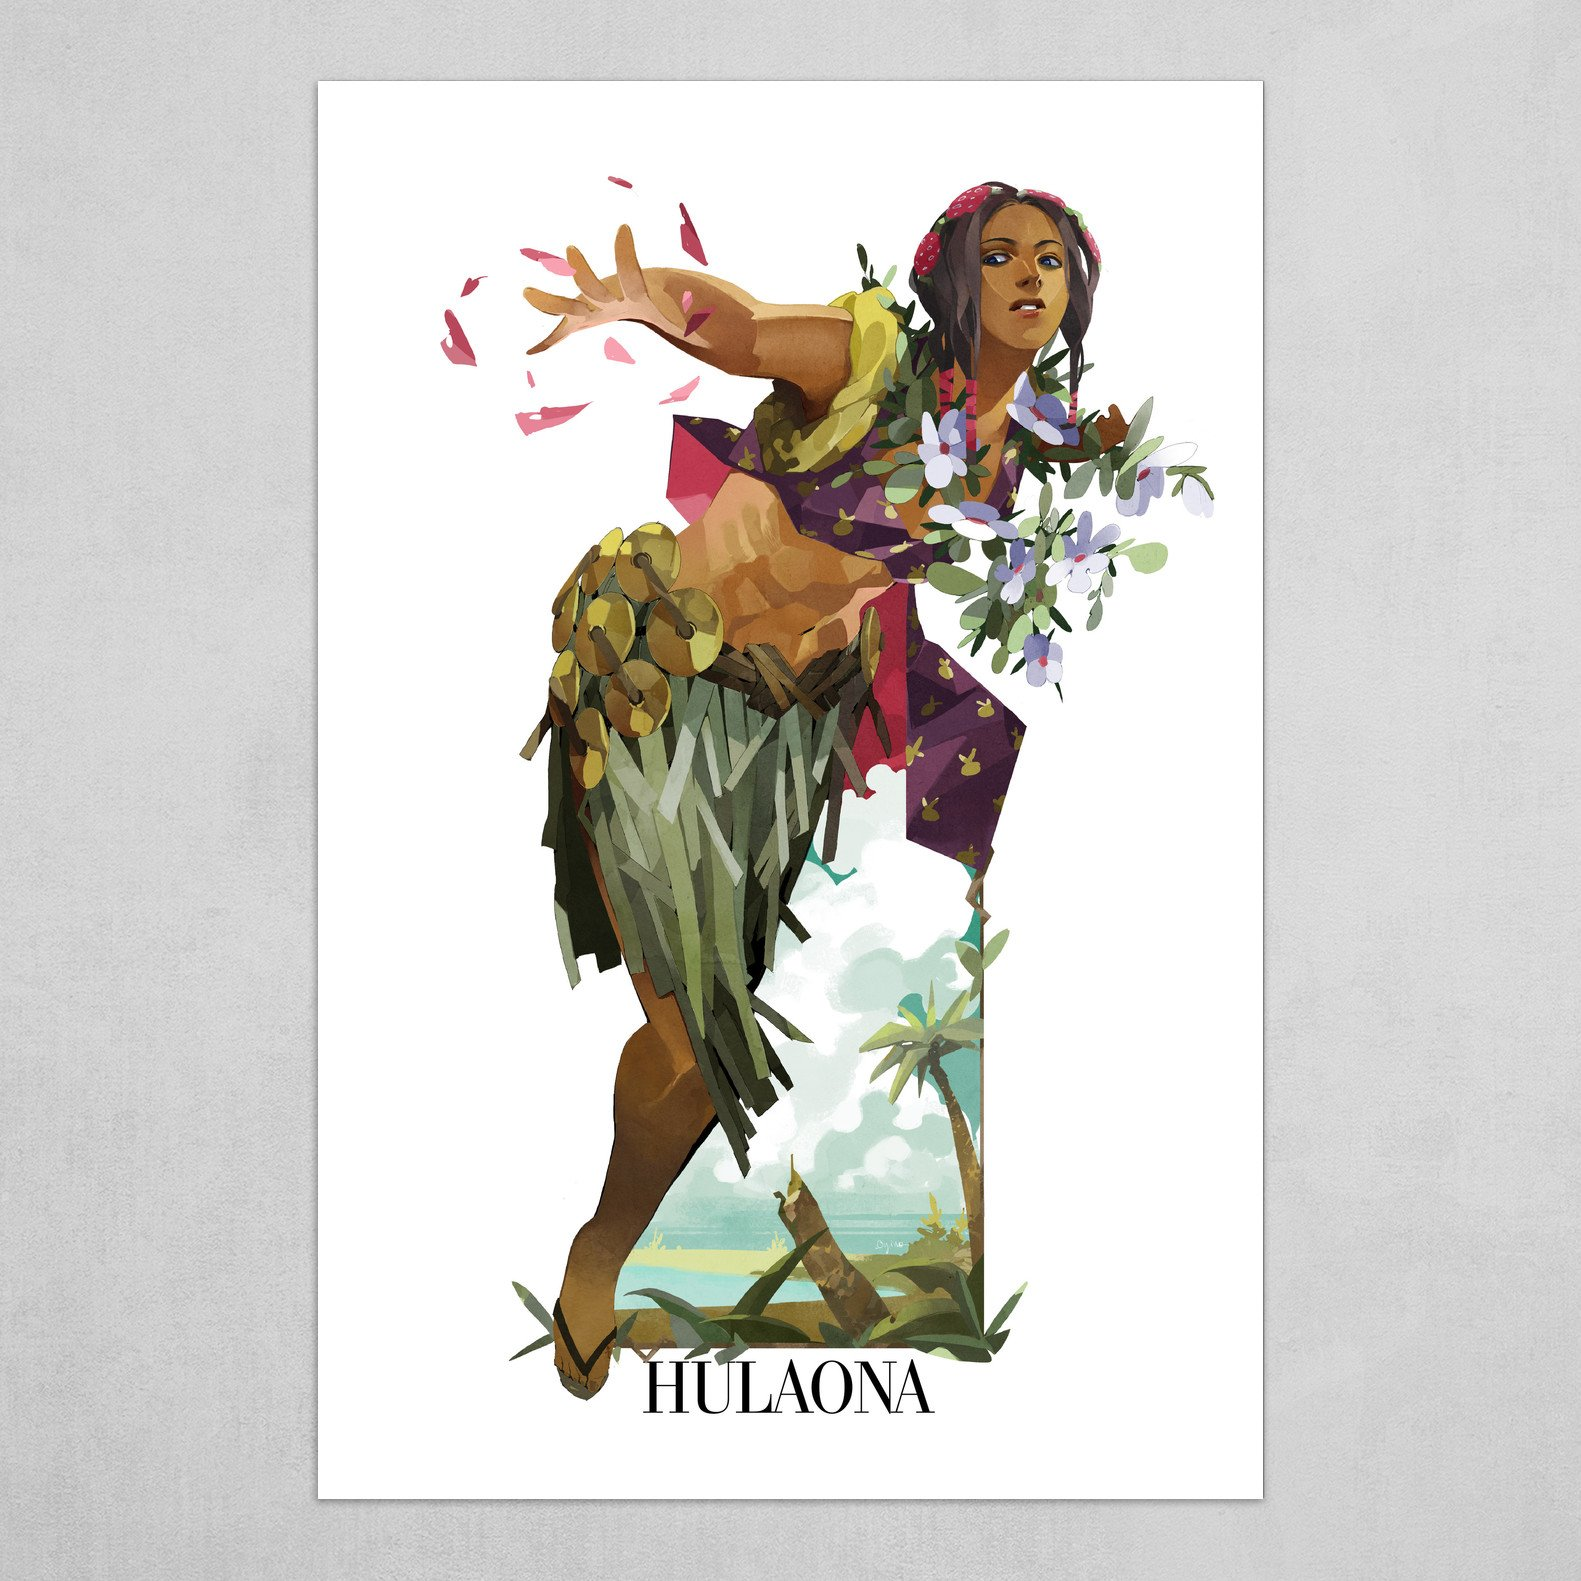 Hulaona